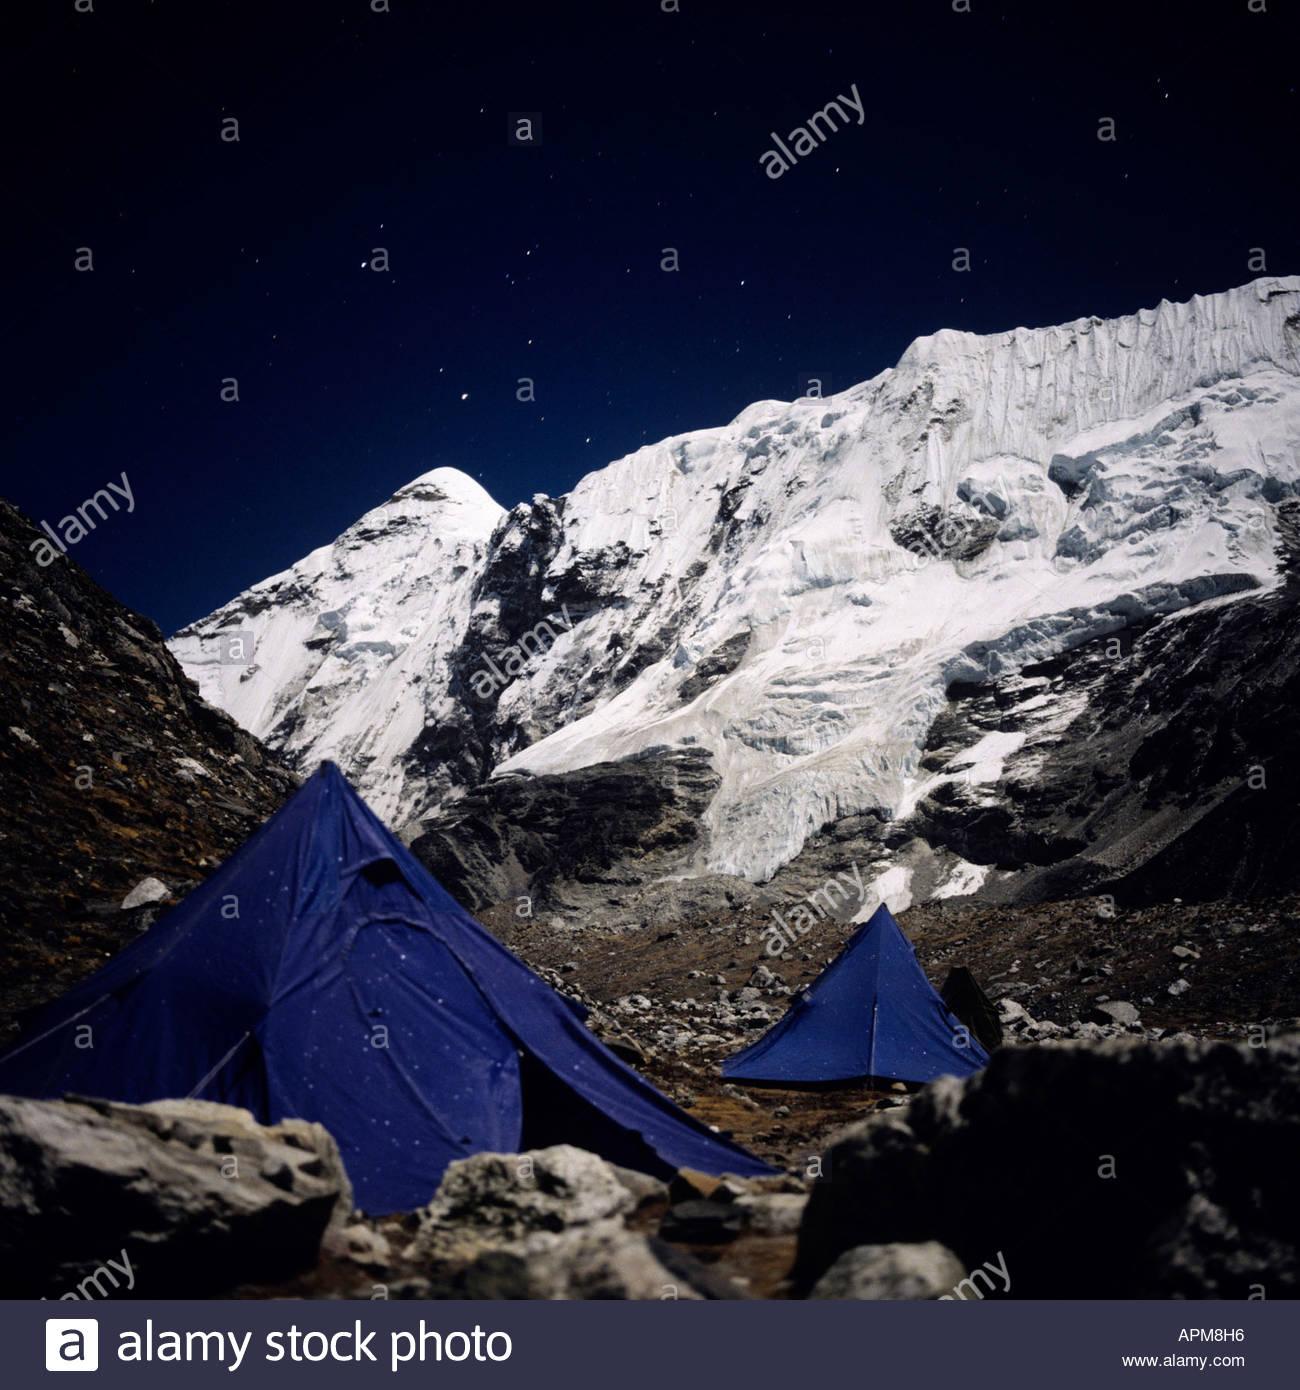 Nepal, Solo Khumbu, Island Peak mit Base Camp in der Nacht Stockbild